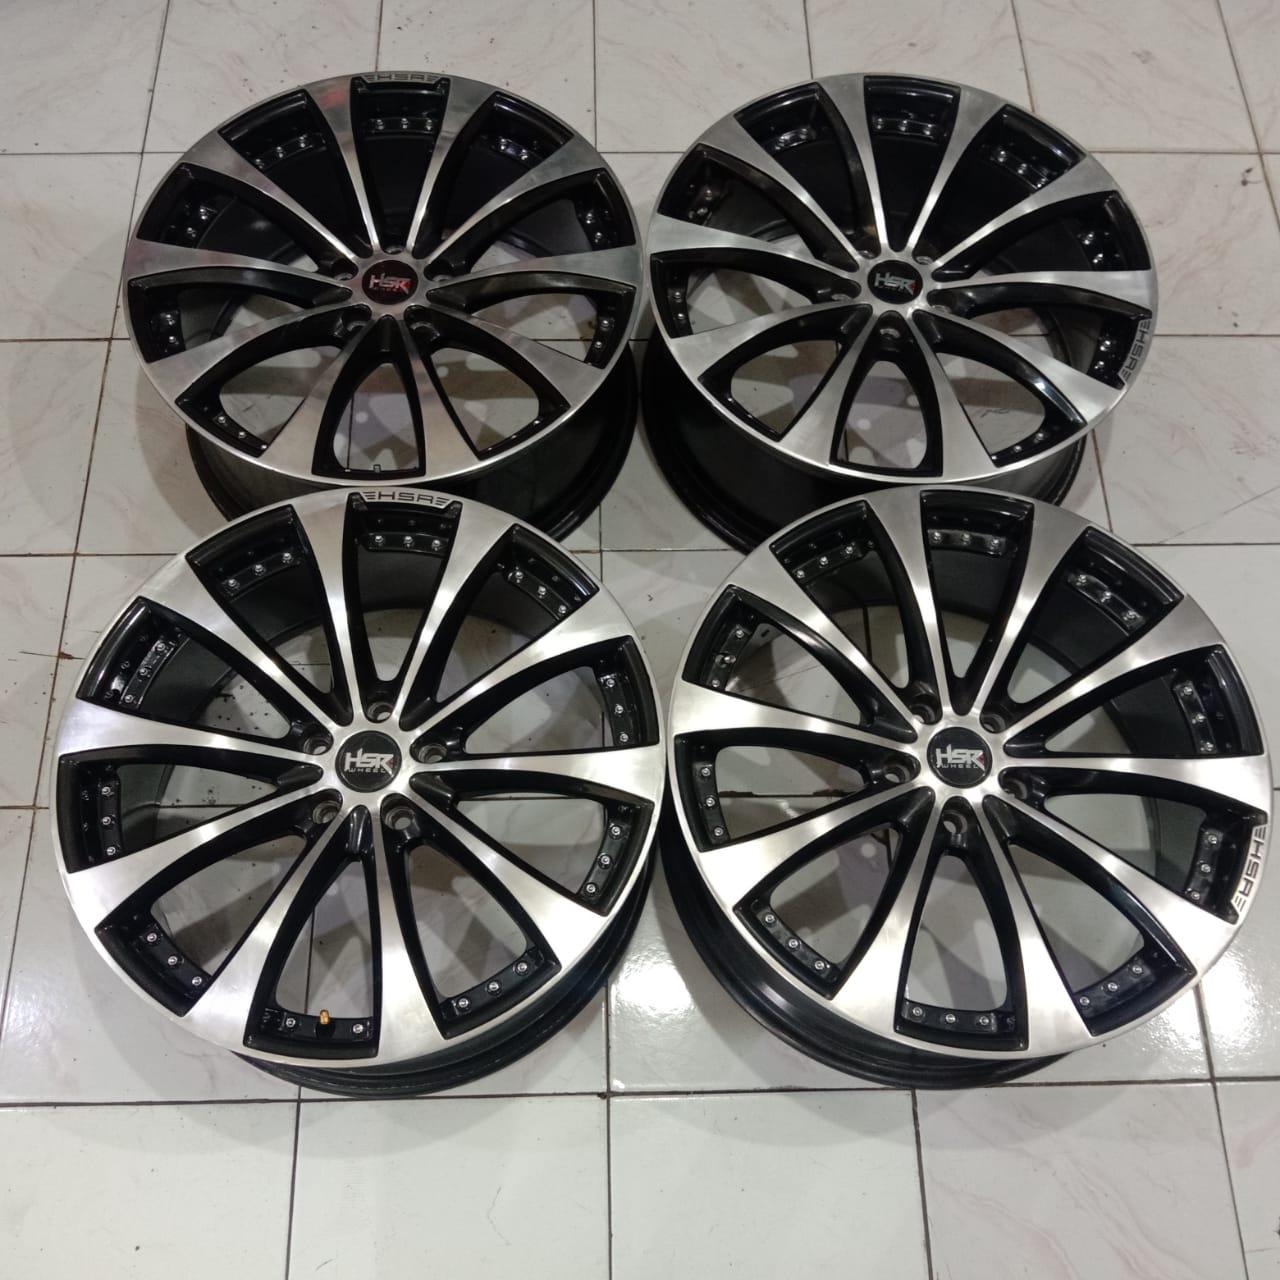 Velg Second Hsr MONACO R20X85 H5X114,3 ET45 Bisa untuk Mobil Crv Civic Innova Xpander Dll